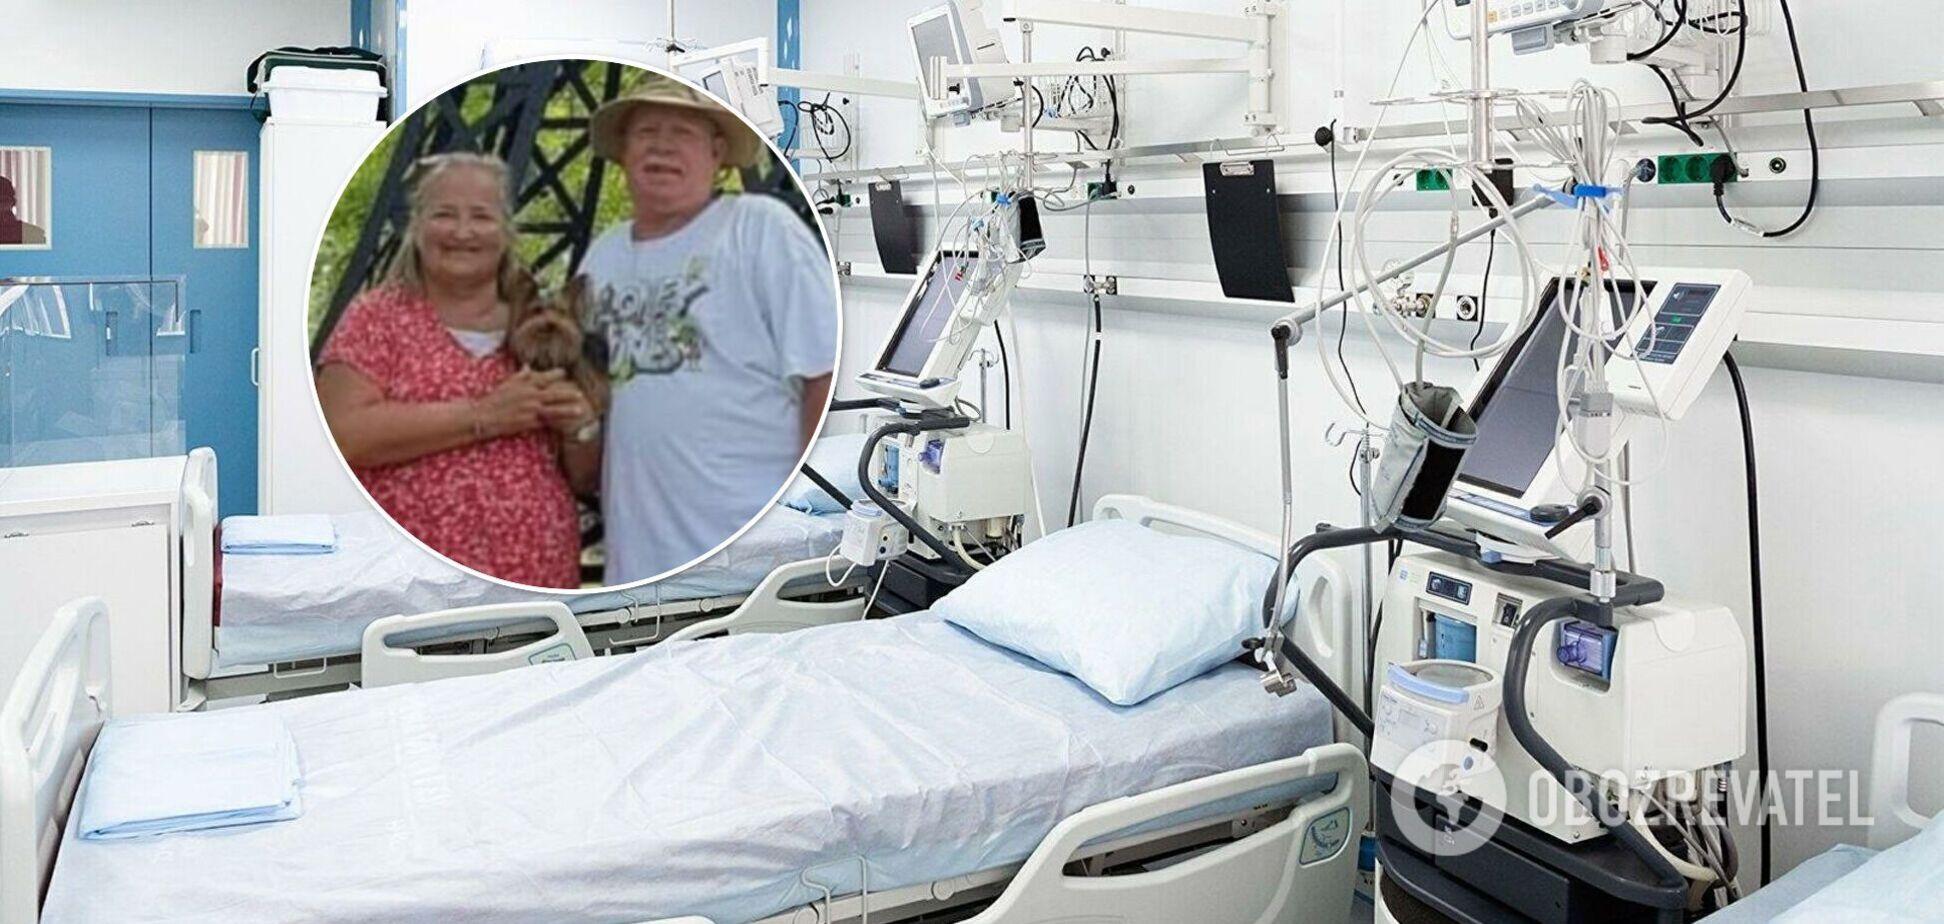 В США муж и жена умерли от коронавируса в больнице с разницей в минуту. Фото